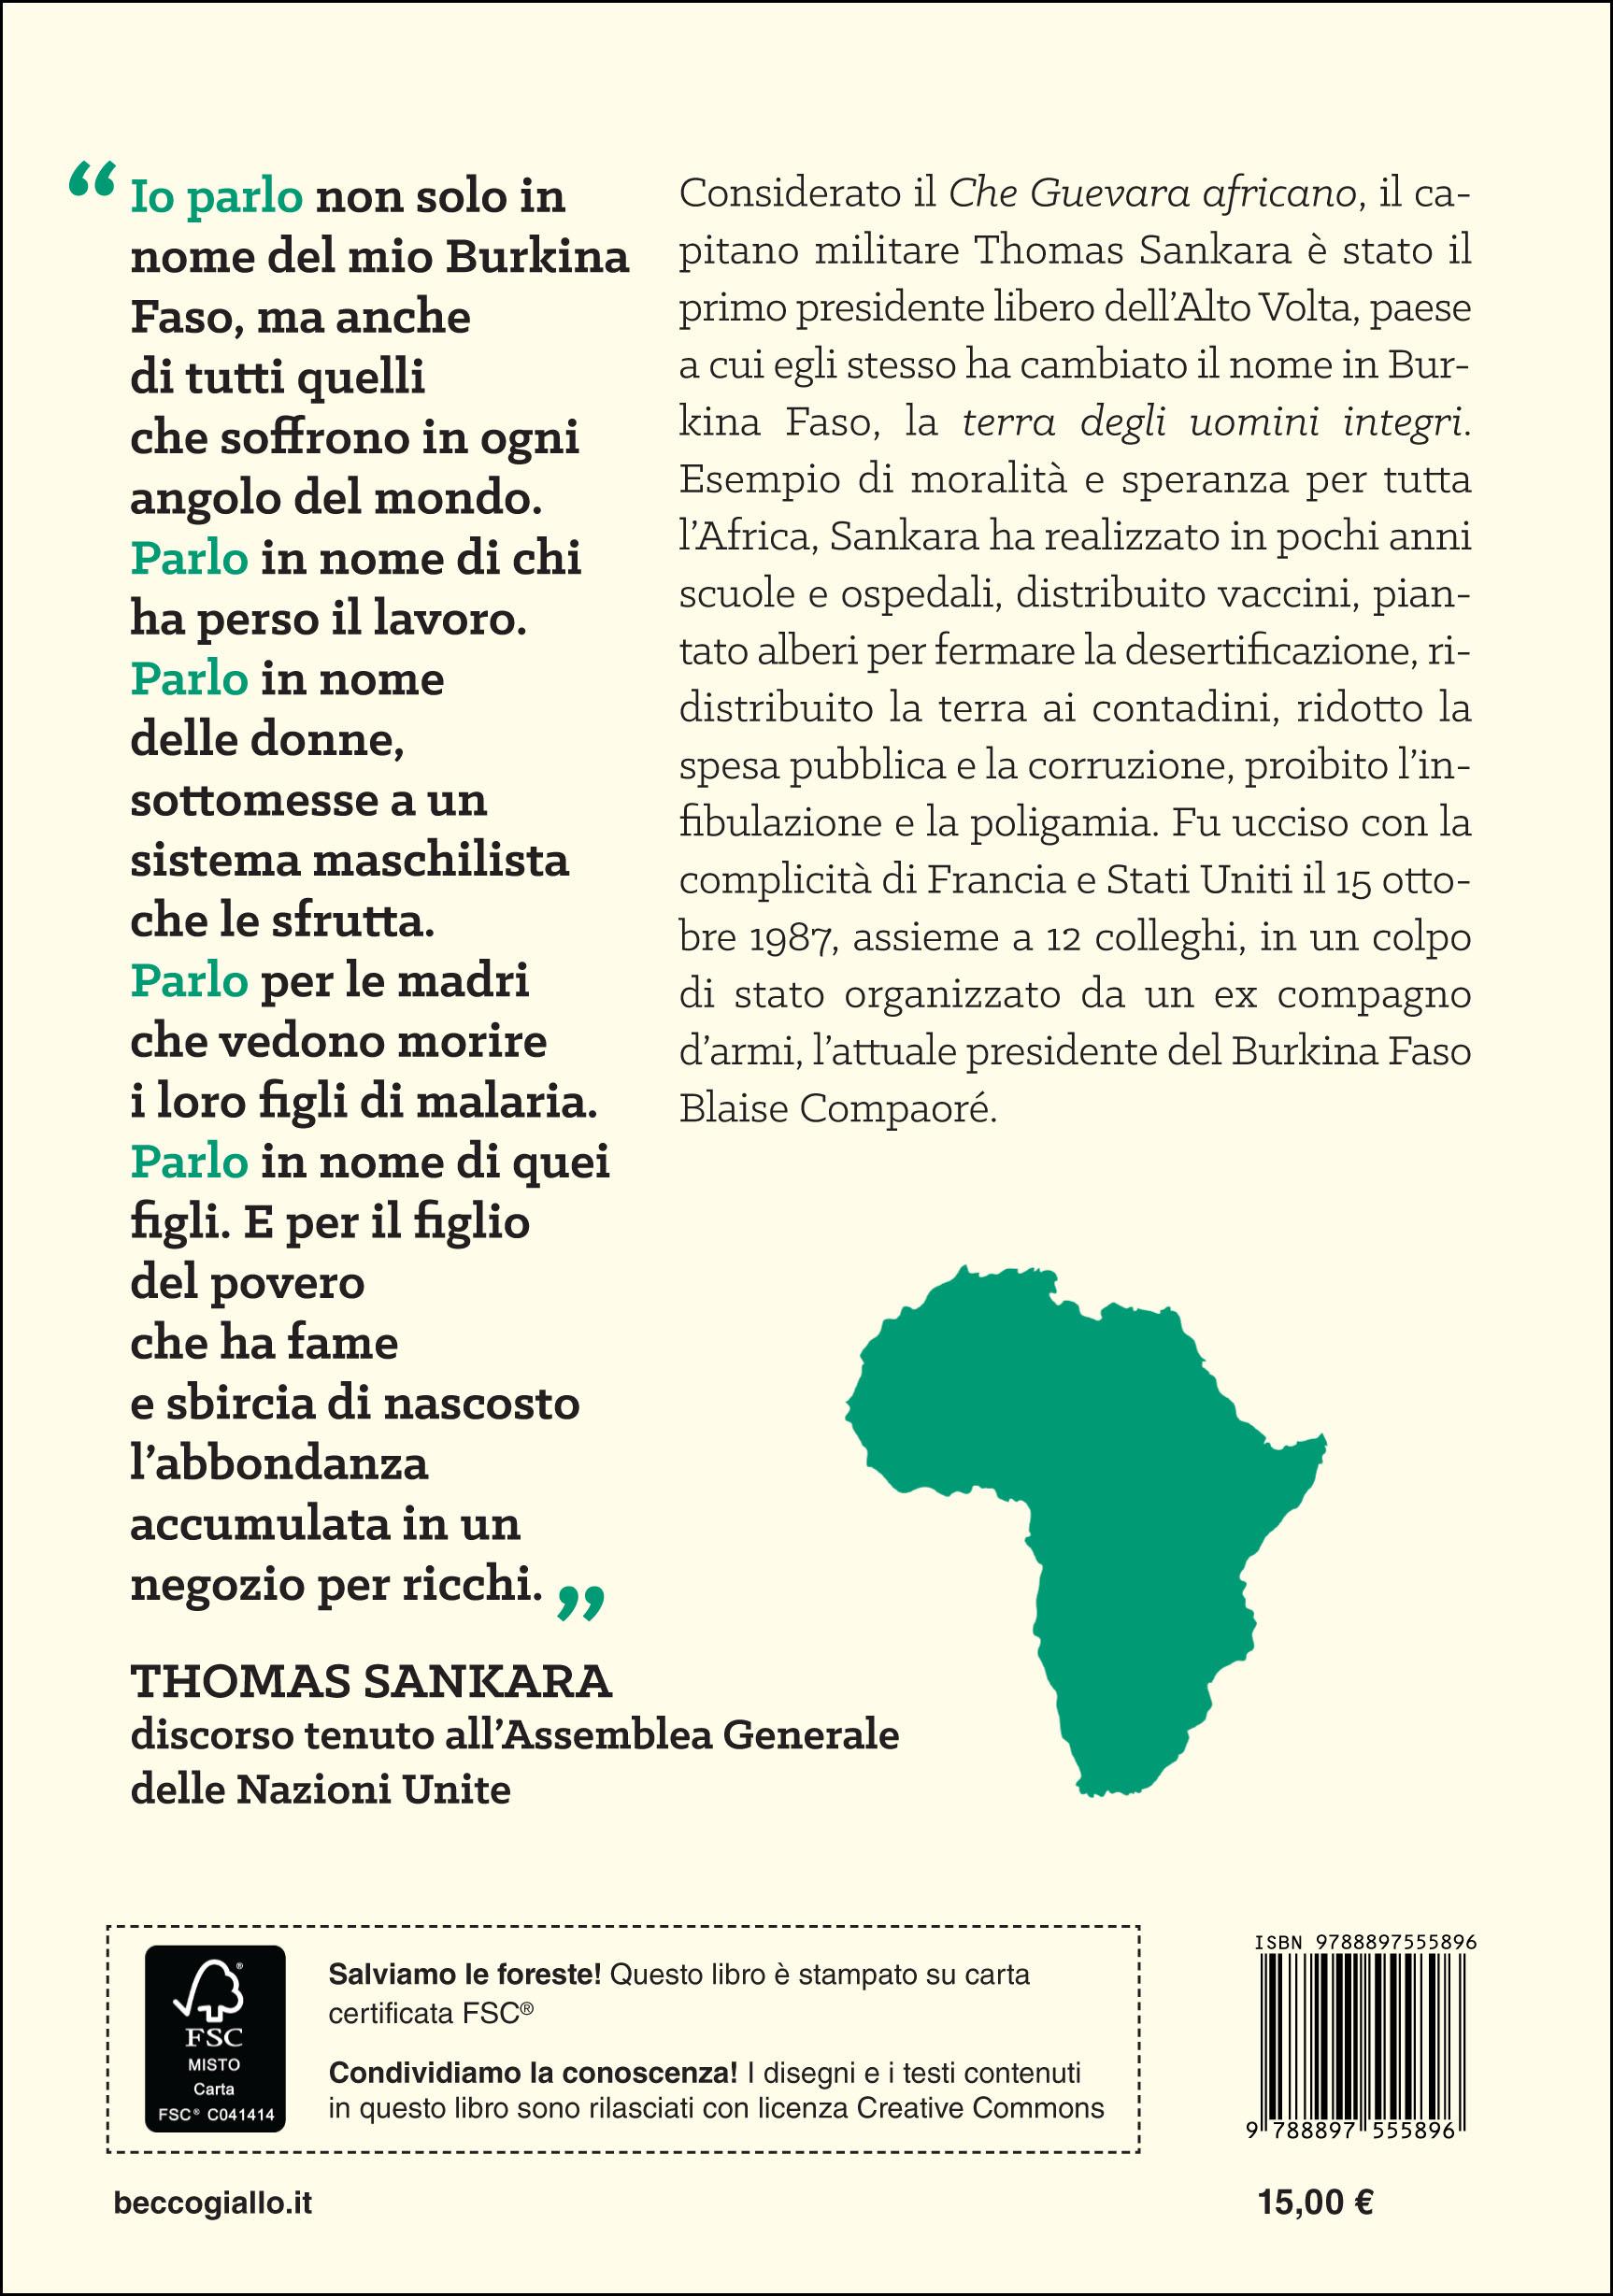 Sostiene Sankara quarta